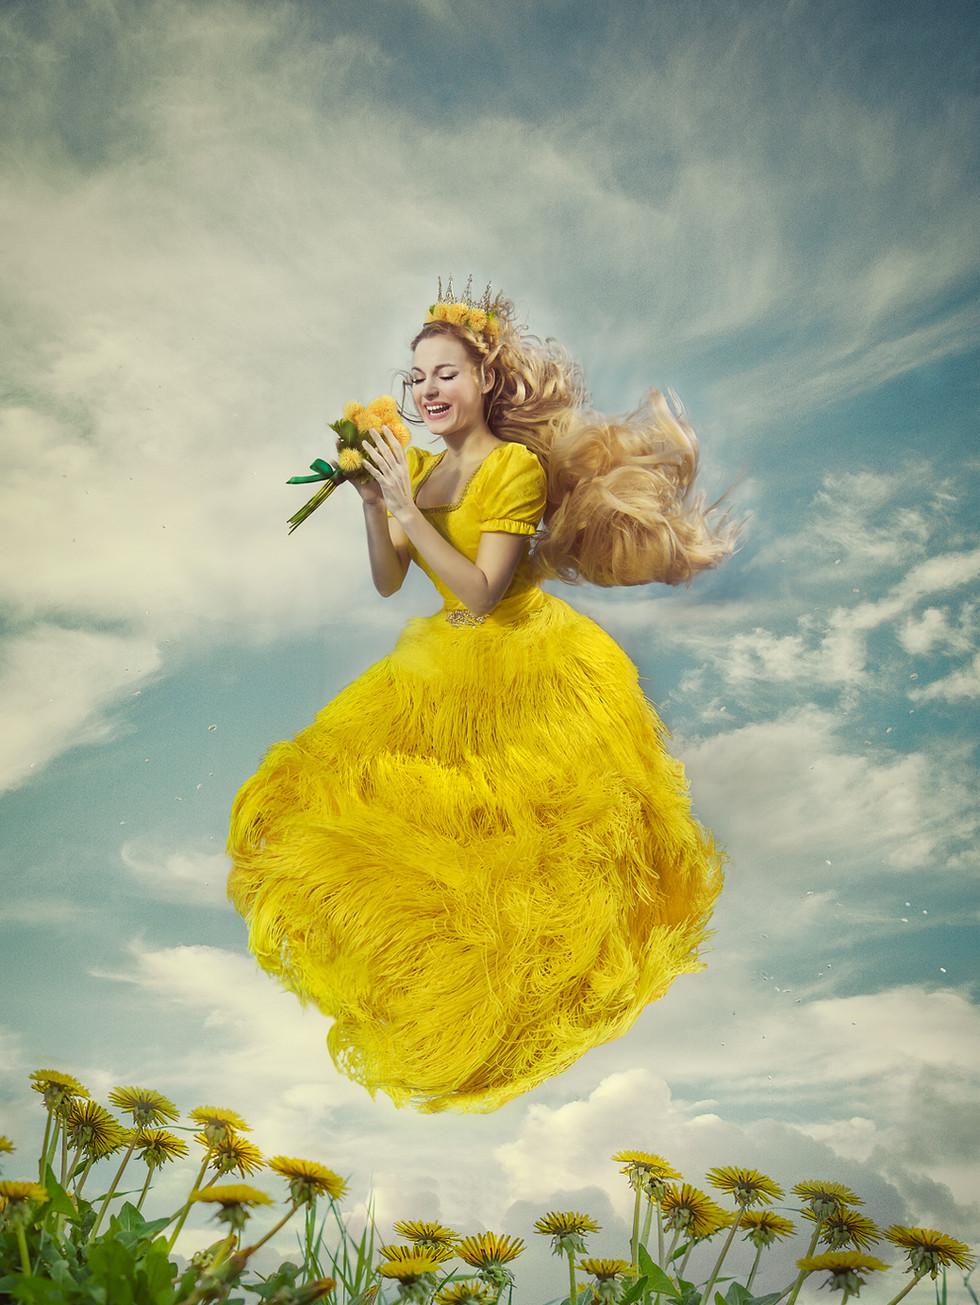 Princess Dandelion